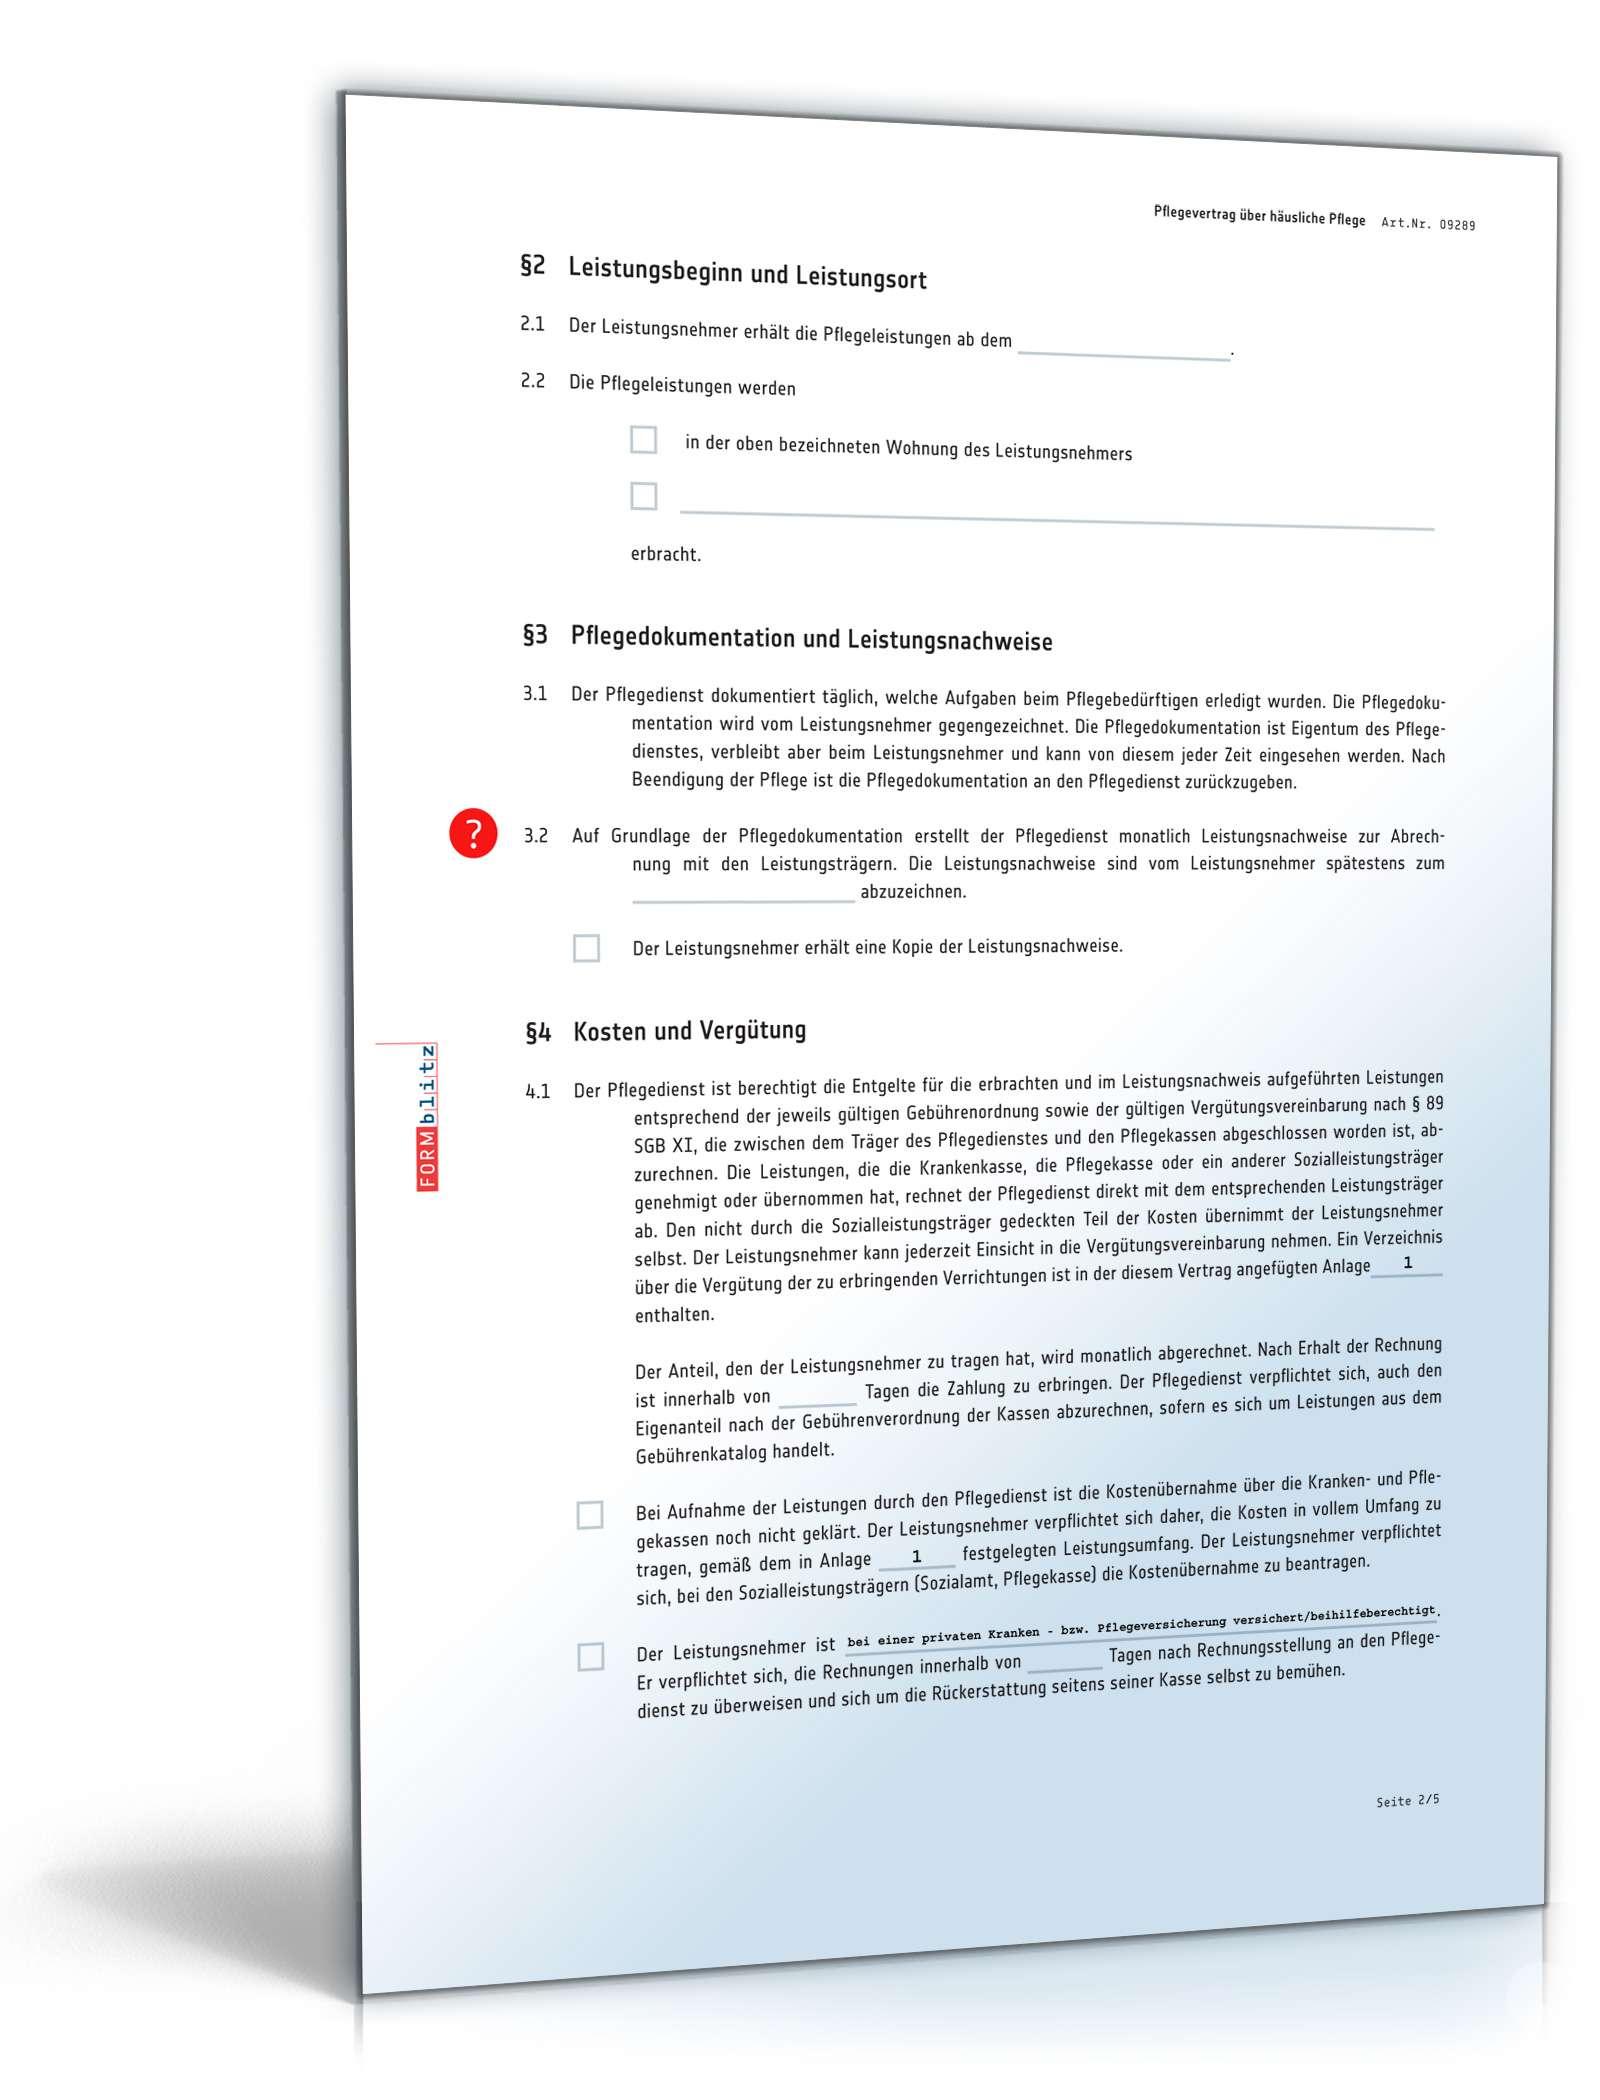 pdf seite 2 - Pflegedokumentation Muster